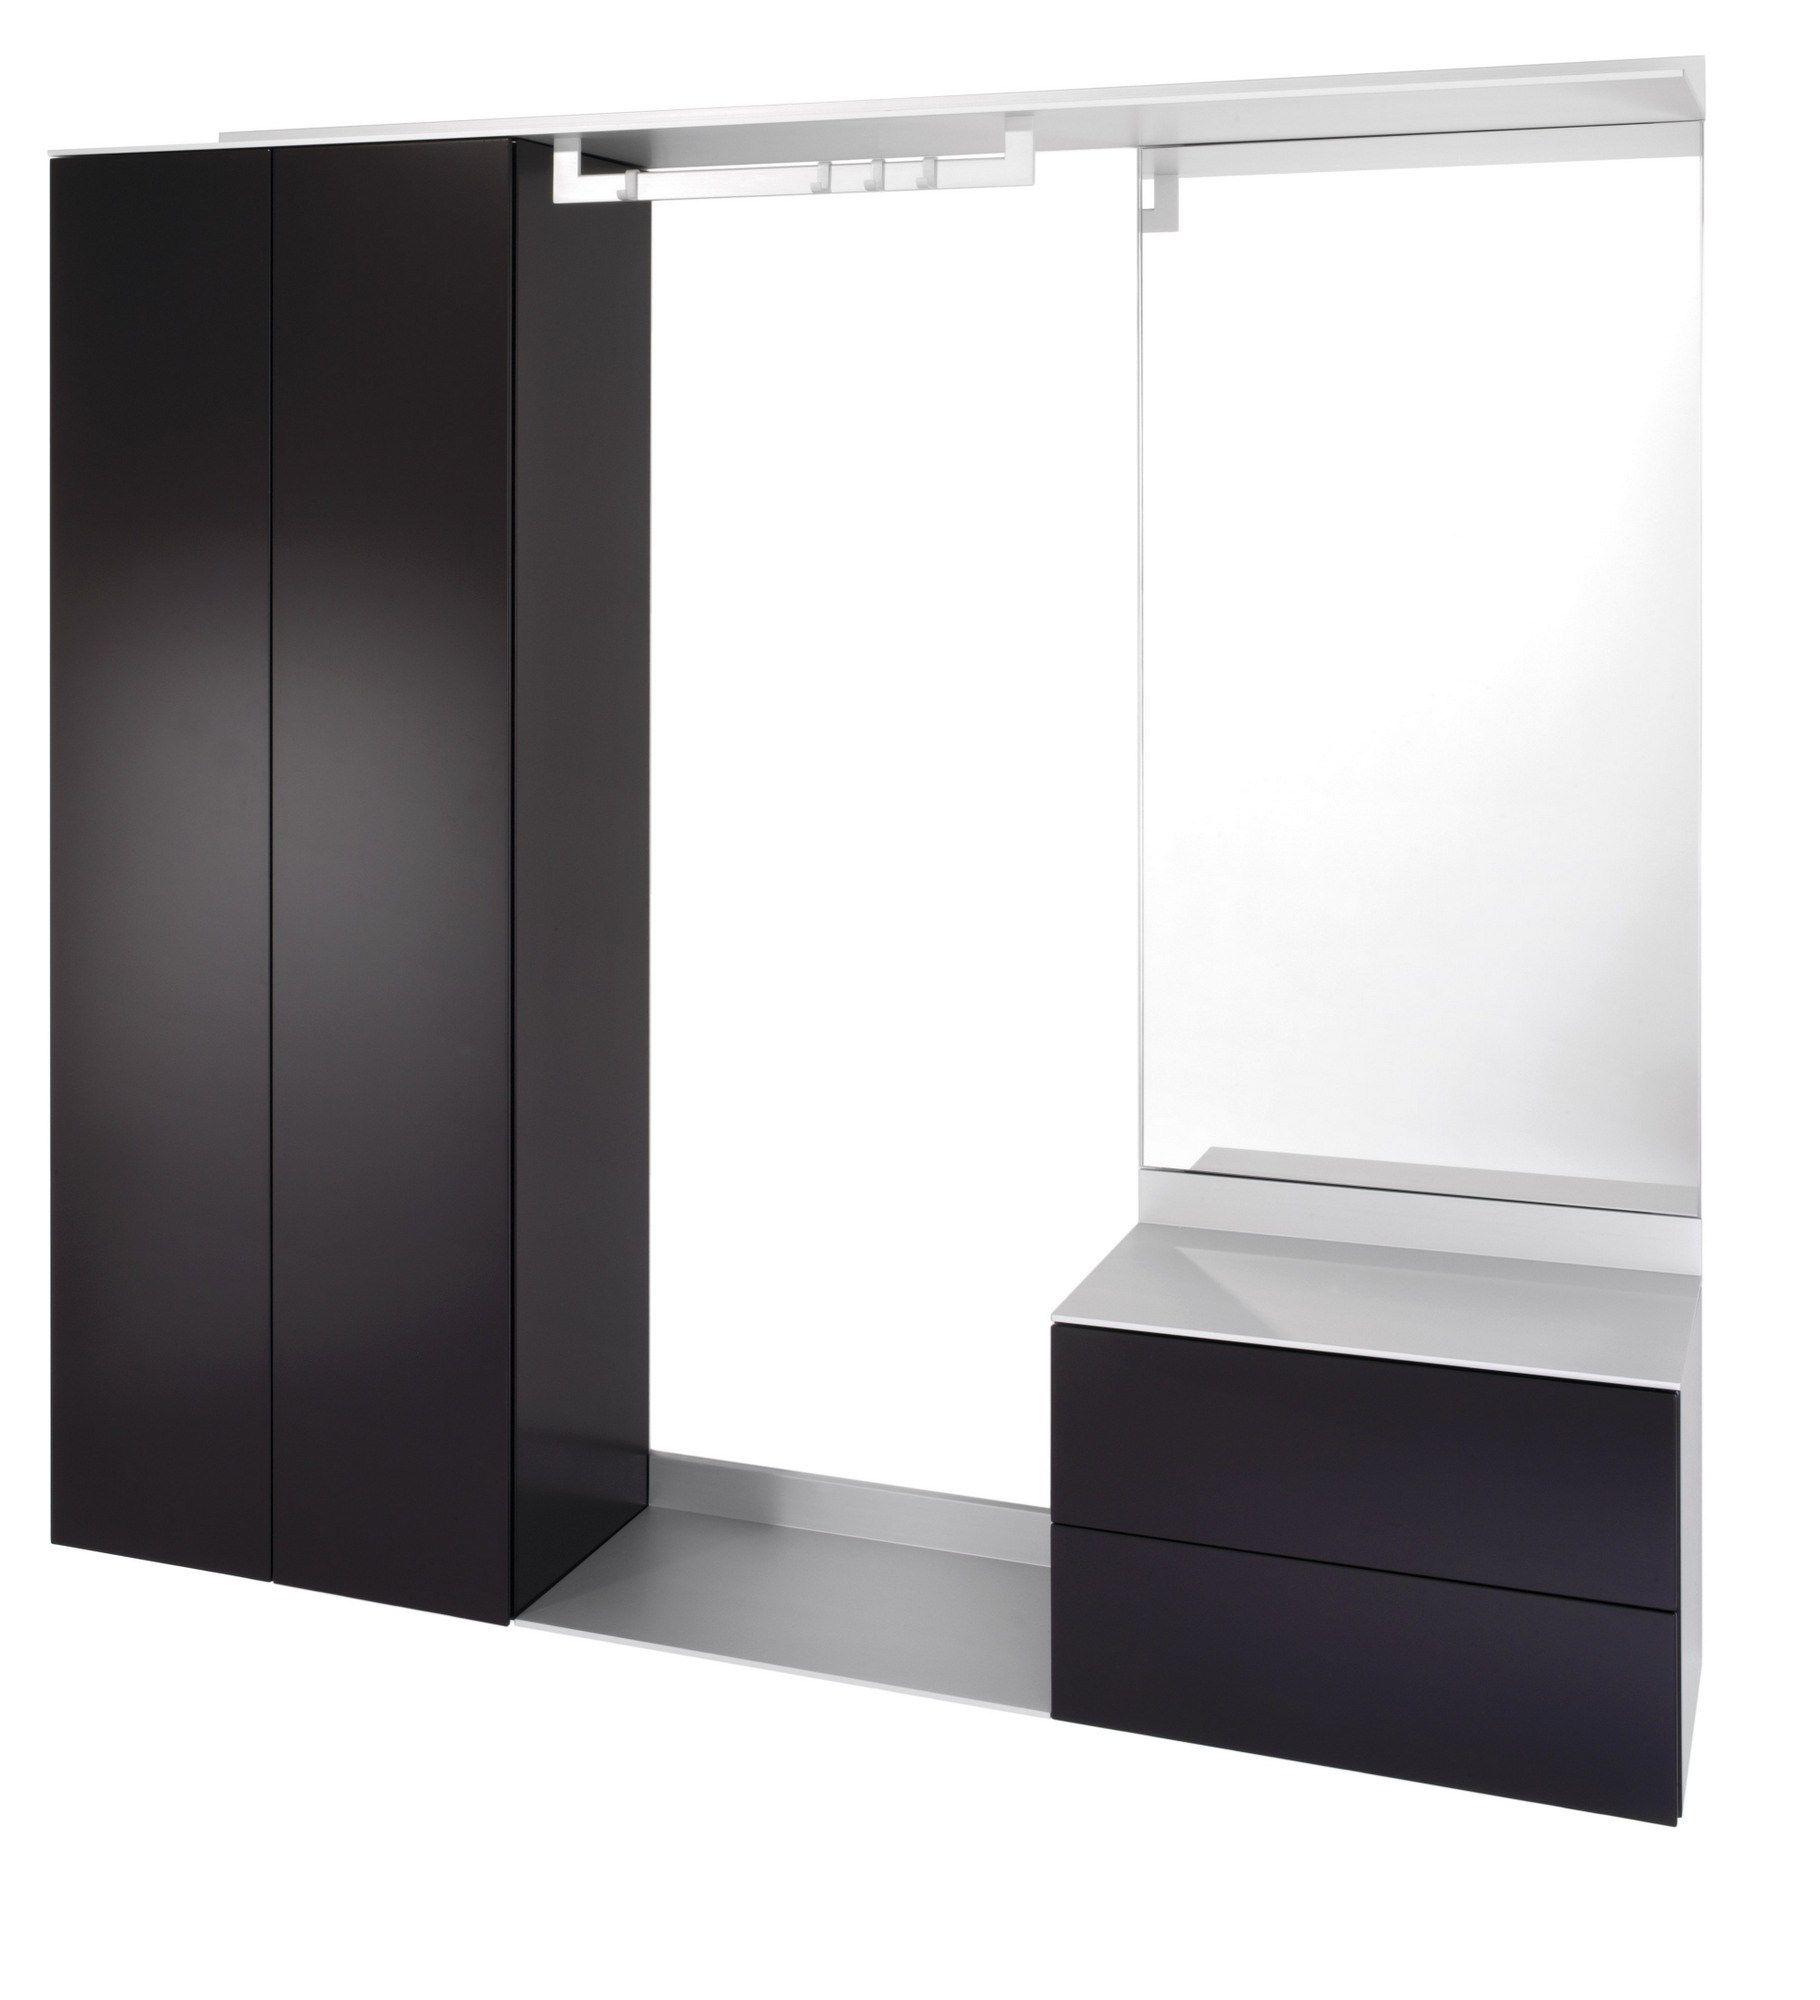 S7 mueble de entrada by sch nbuch dise o dante bonuccelli - Mueble de entrada ...